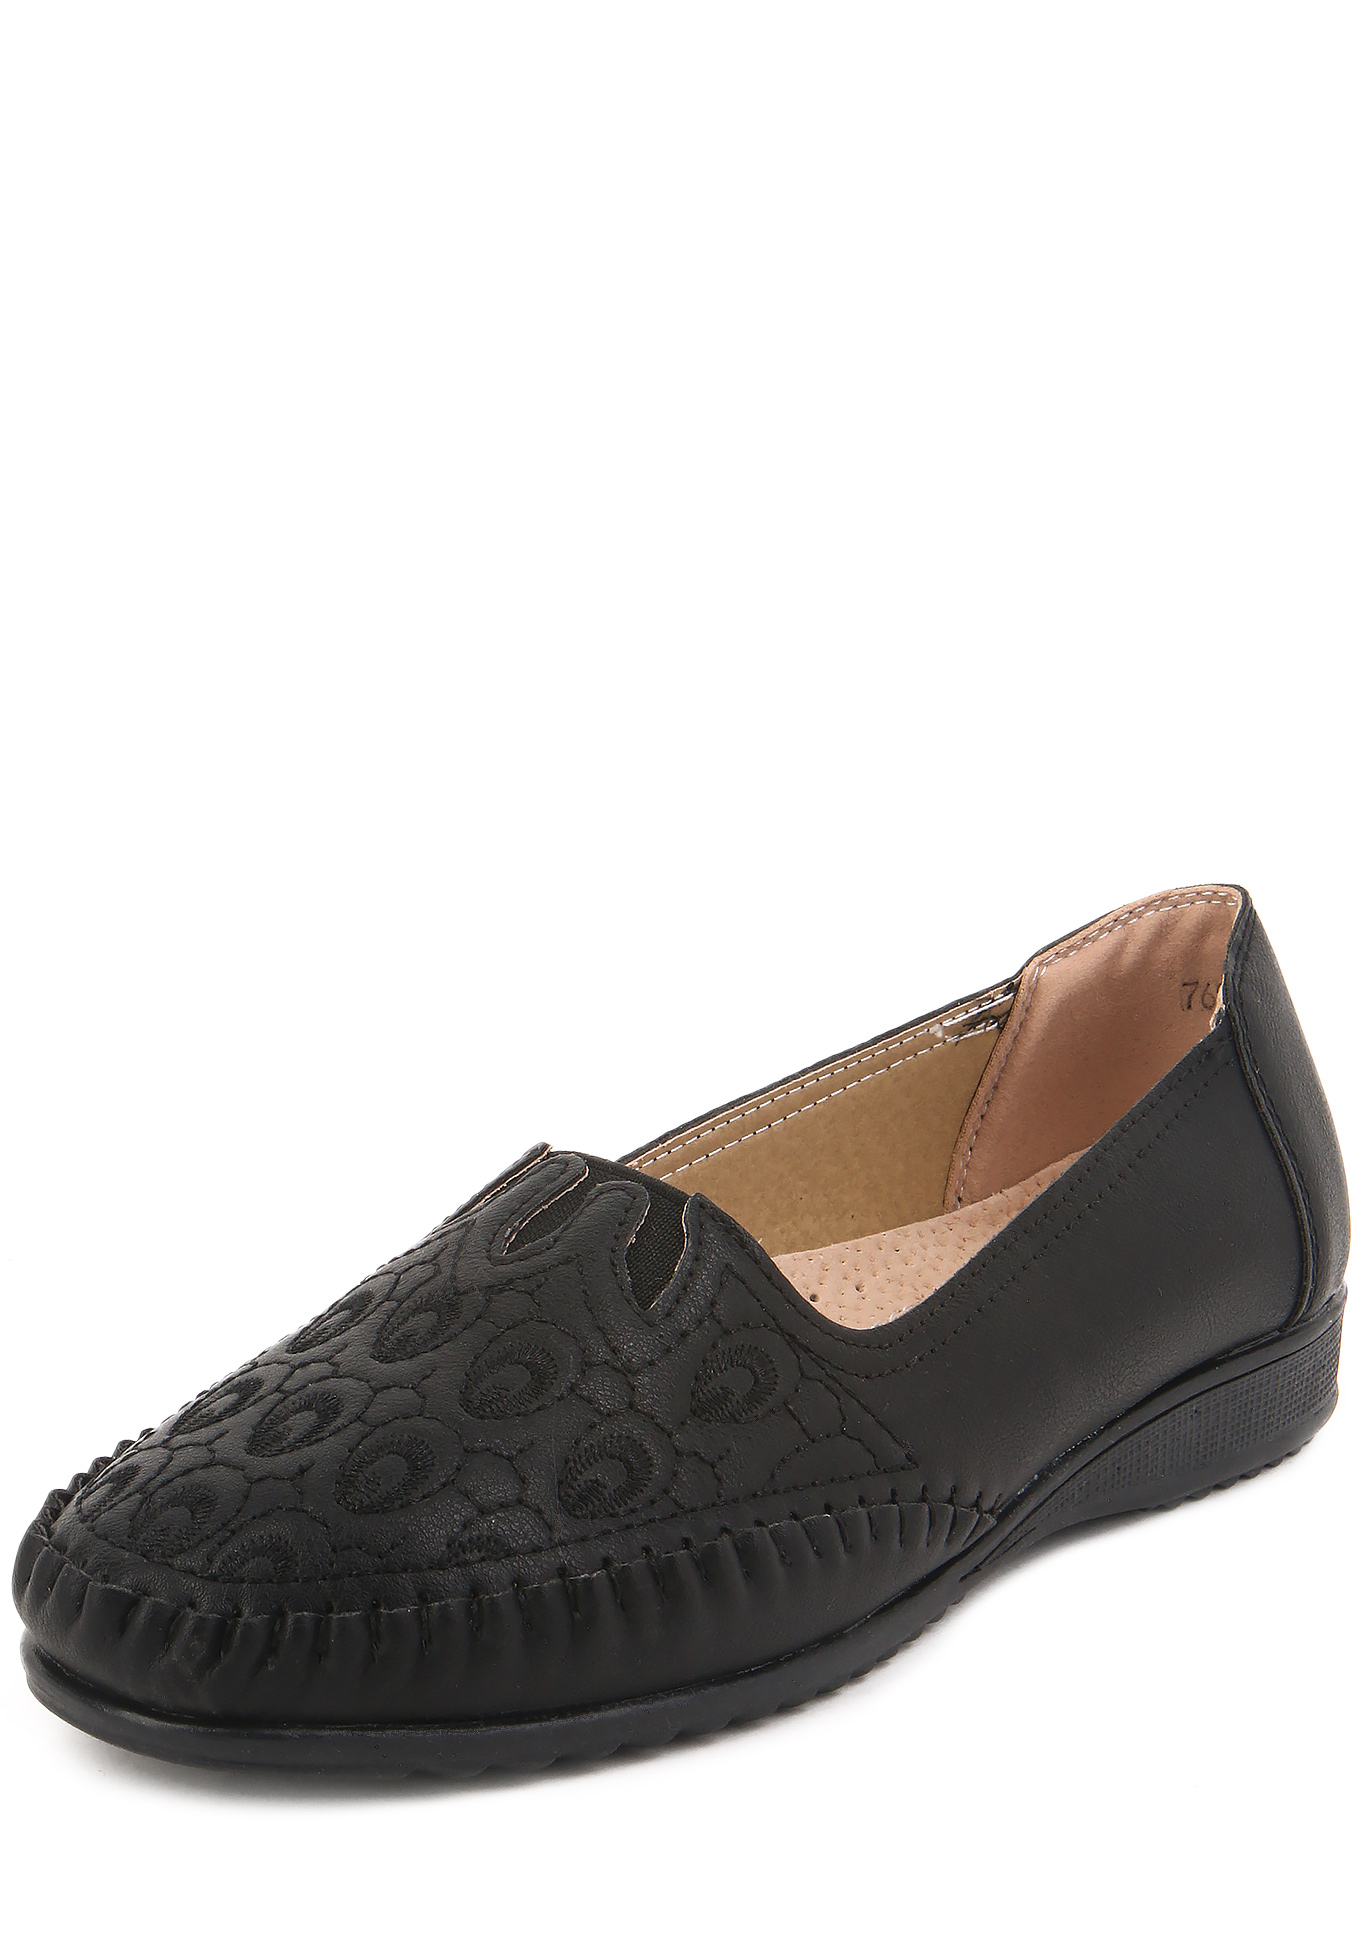 Туфли женские Мануэлла